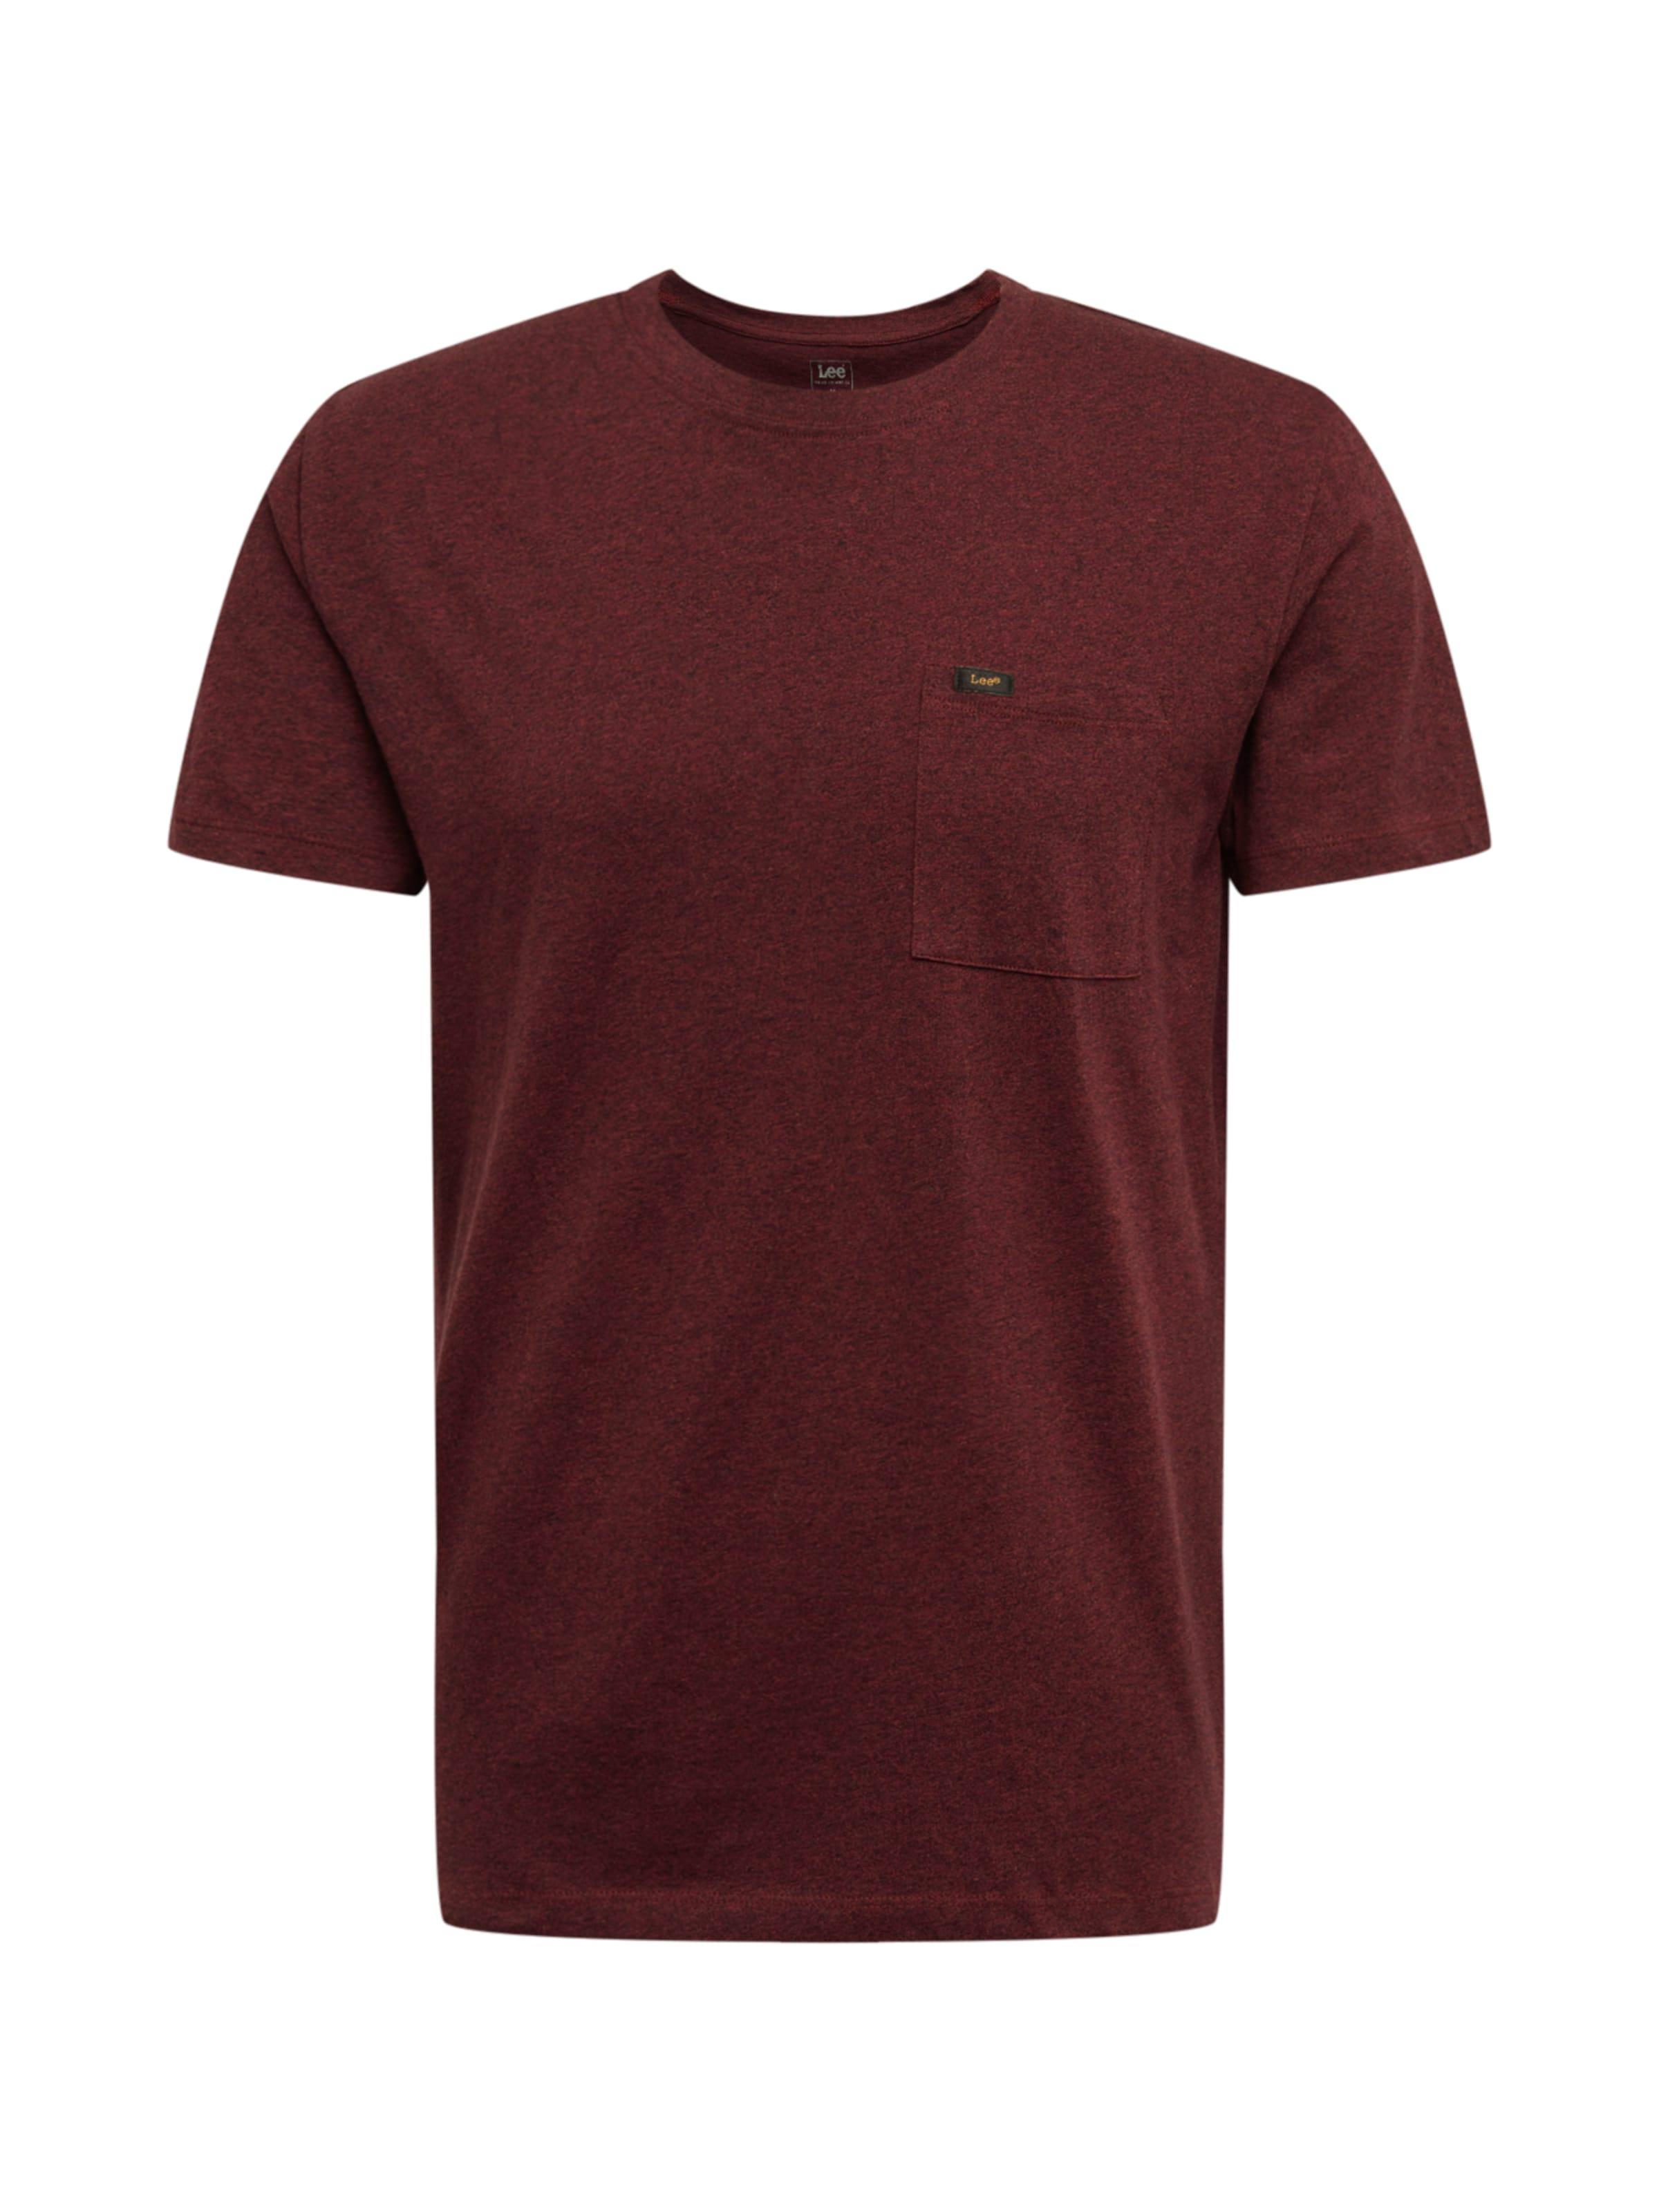 shirt Bourgogne T Pocket' En Lee 'ultimate WrCoxedB